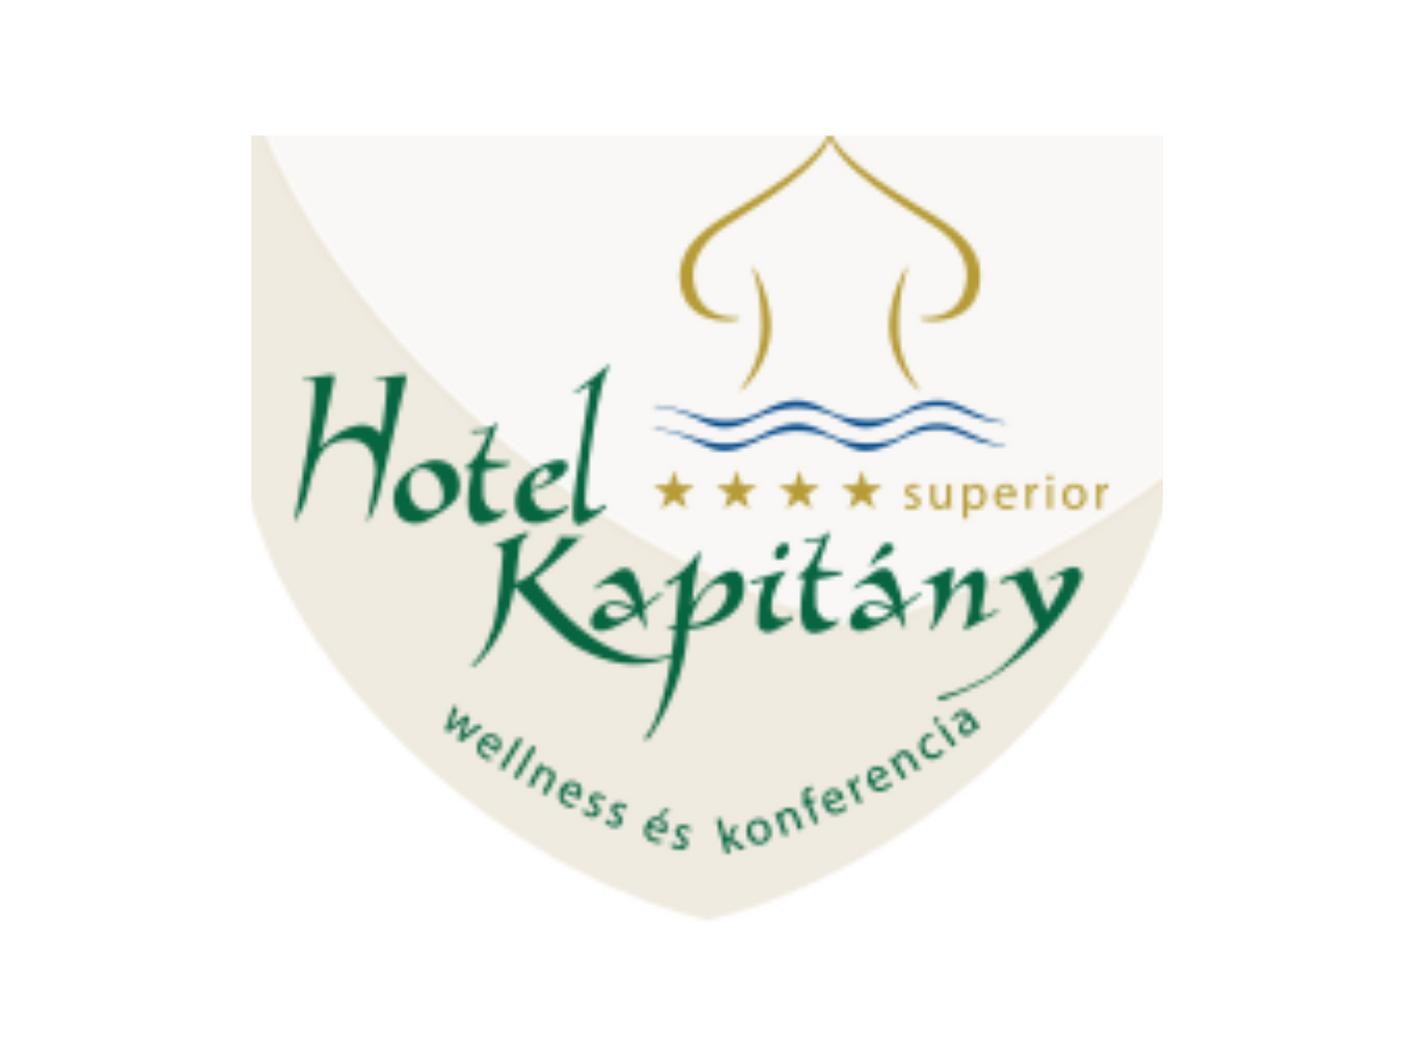 Hotel Kapitány Wellness****superior